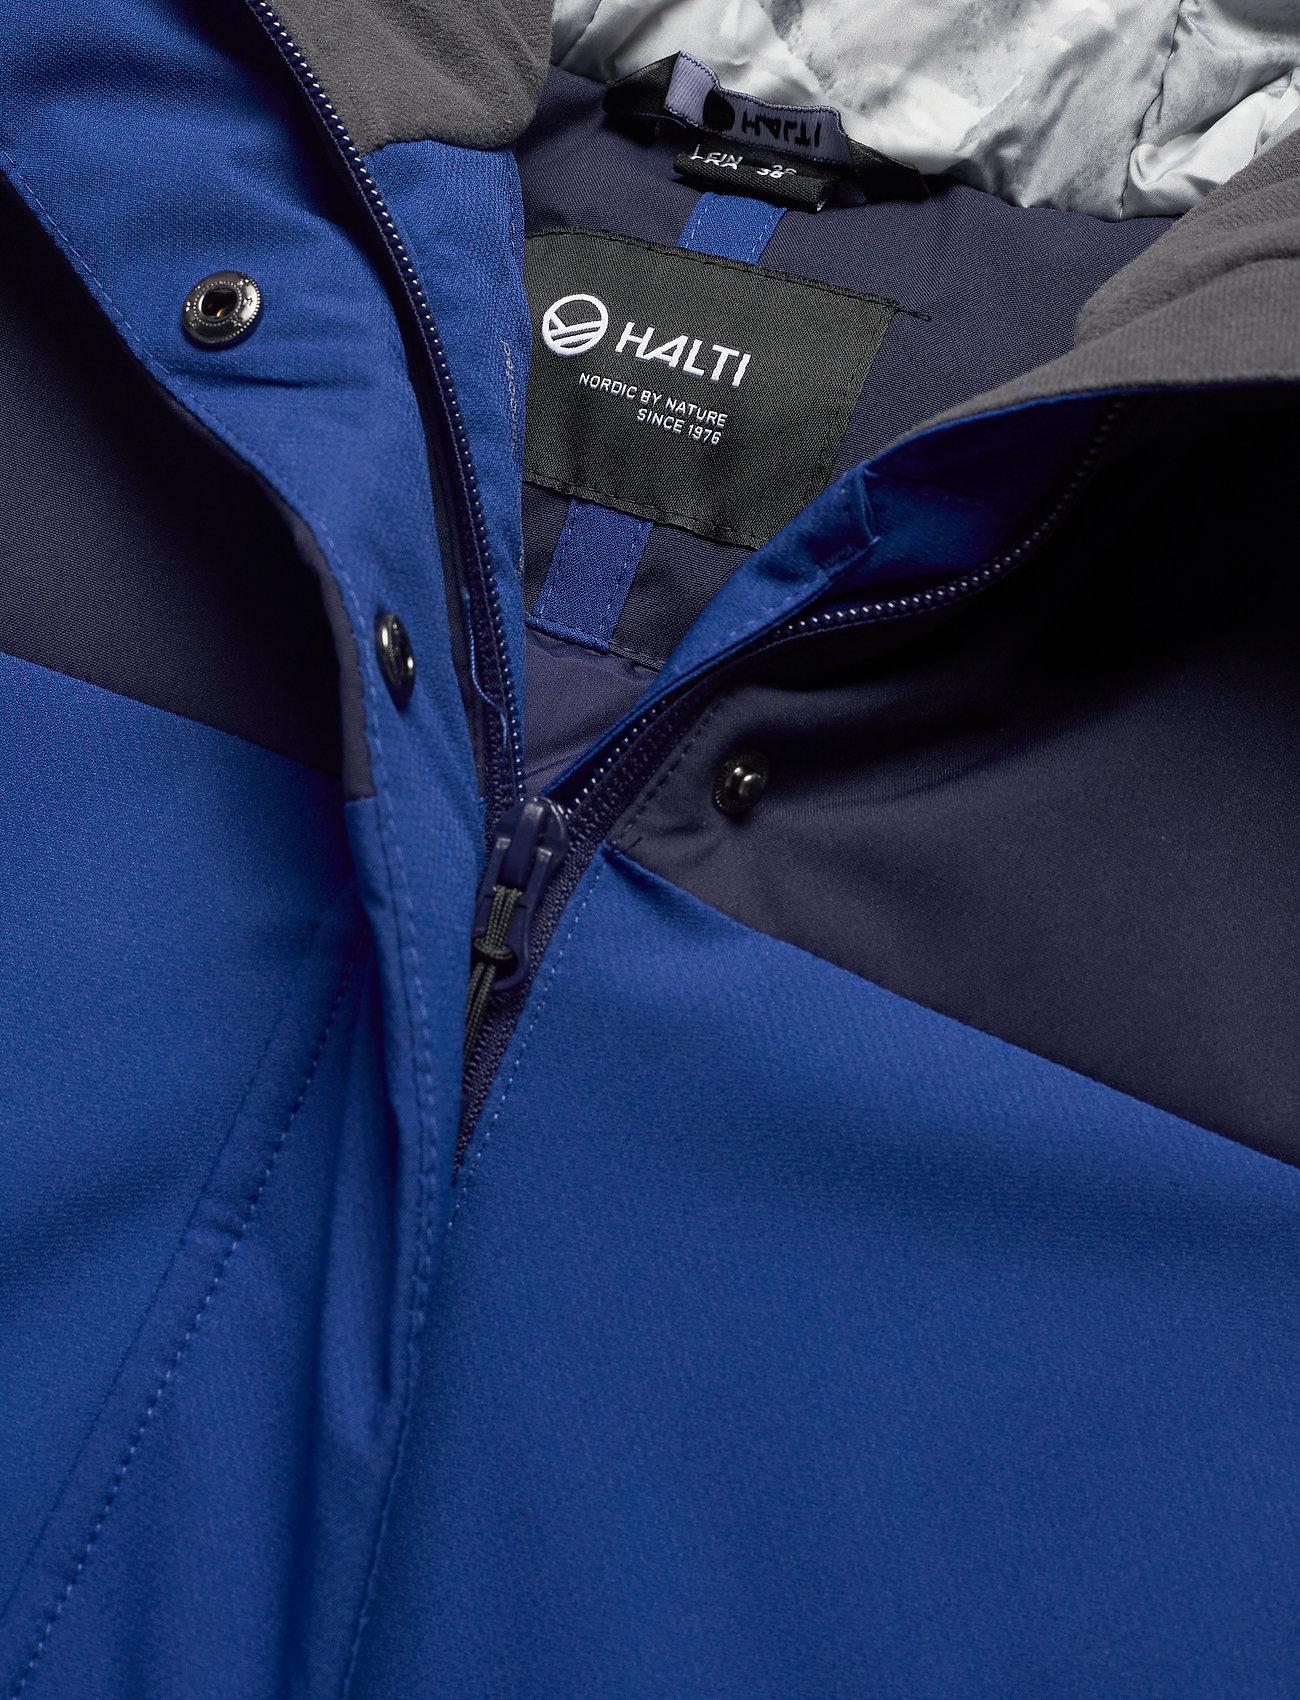 Kilta Women's Dx Ski Jacket (Sodalite Blue) (174.50 €) - Halti 3t675